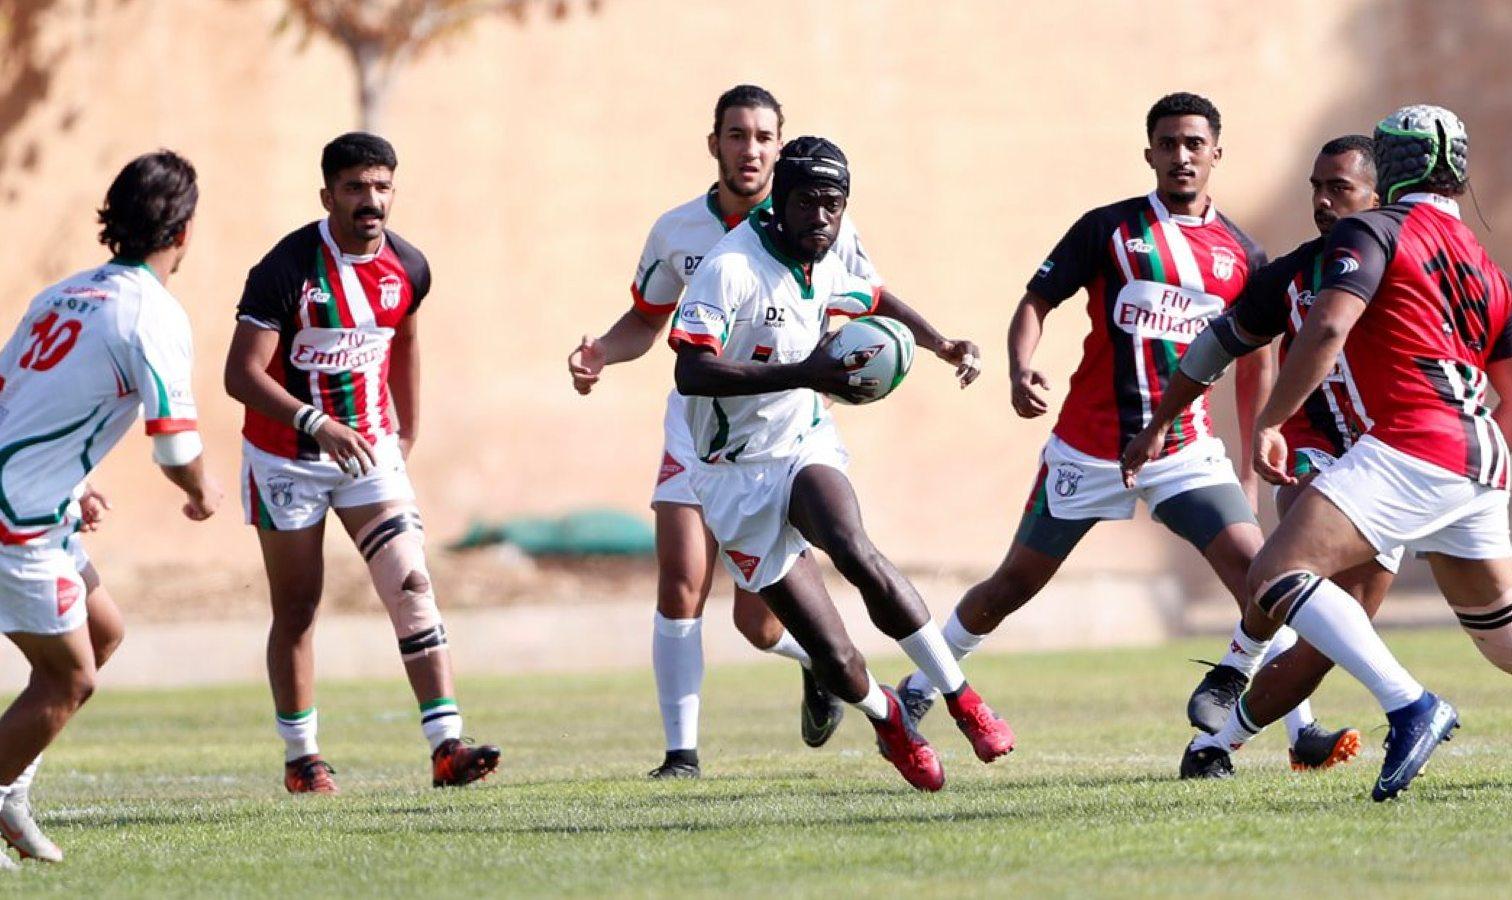 diakite zakaria emirats au algerie rugby a 7